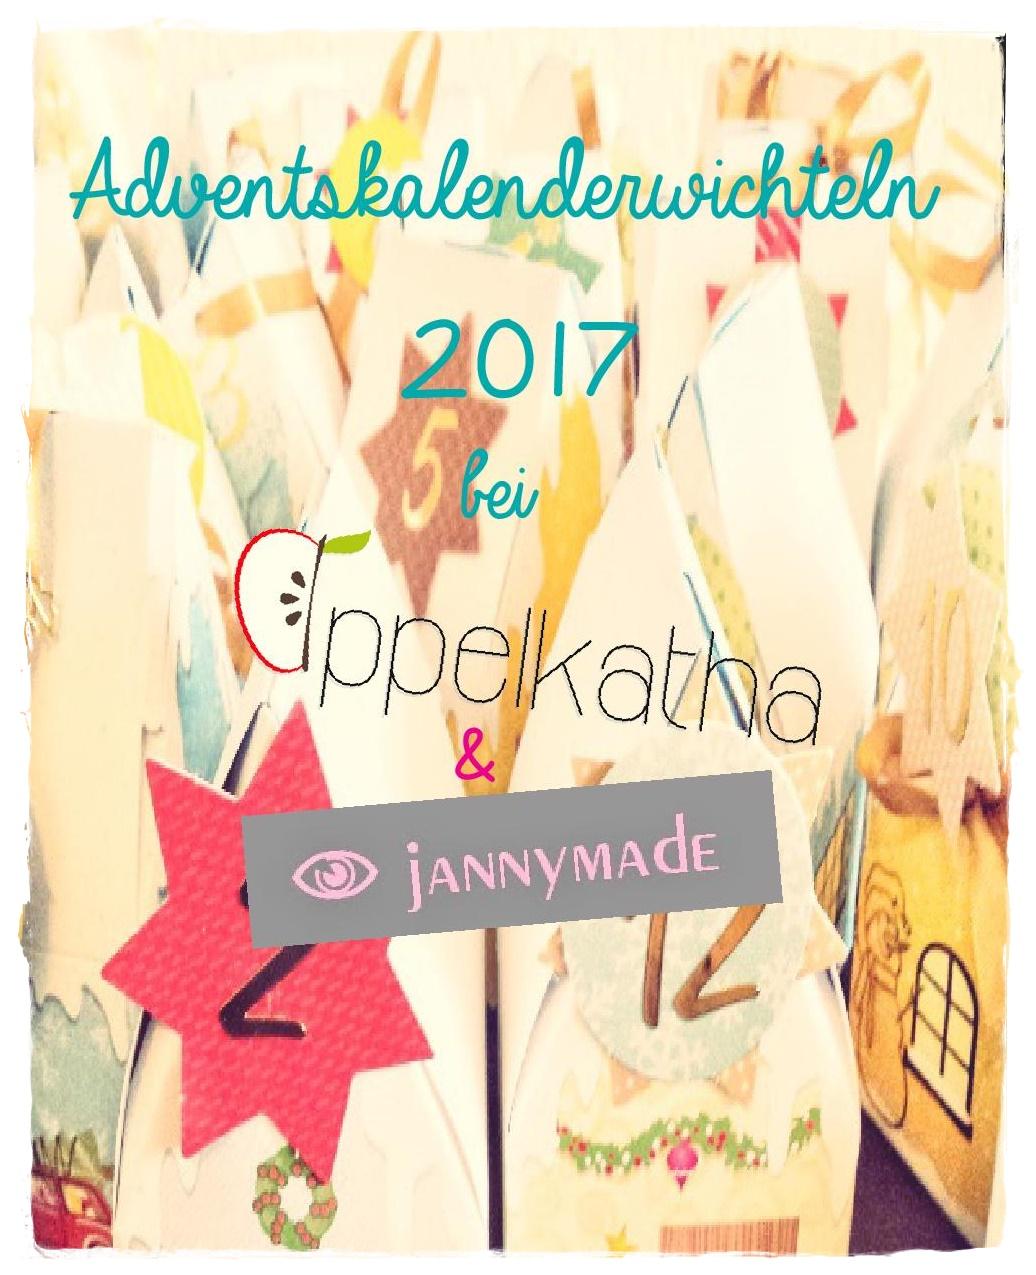 Adventskalenderwichteln 2017